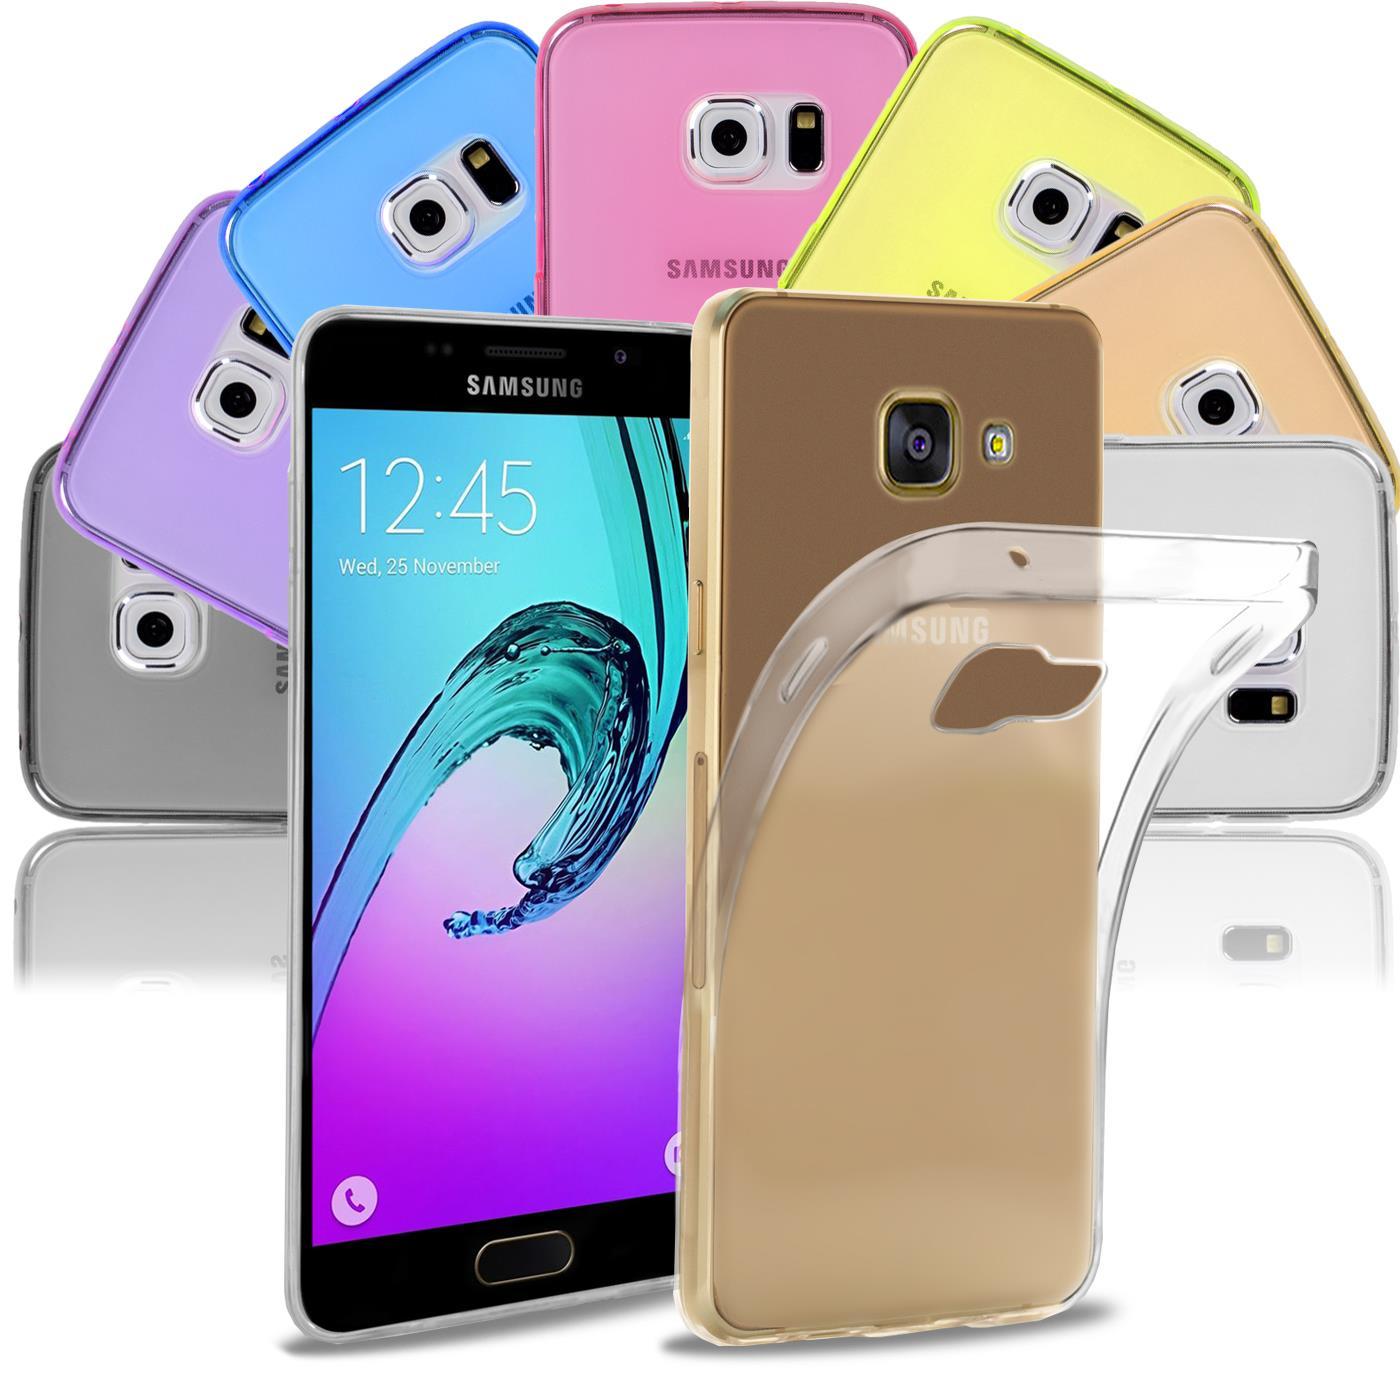 Samsung-Galaxy-a3-2016-Thin-Silikon-Klar-Case-Cover-Ultra-Slim-Stossfeste-Gel